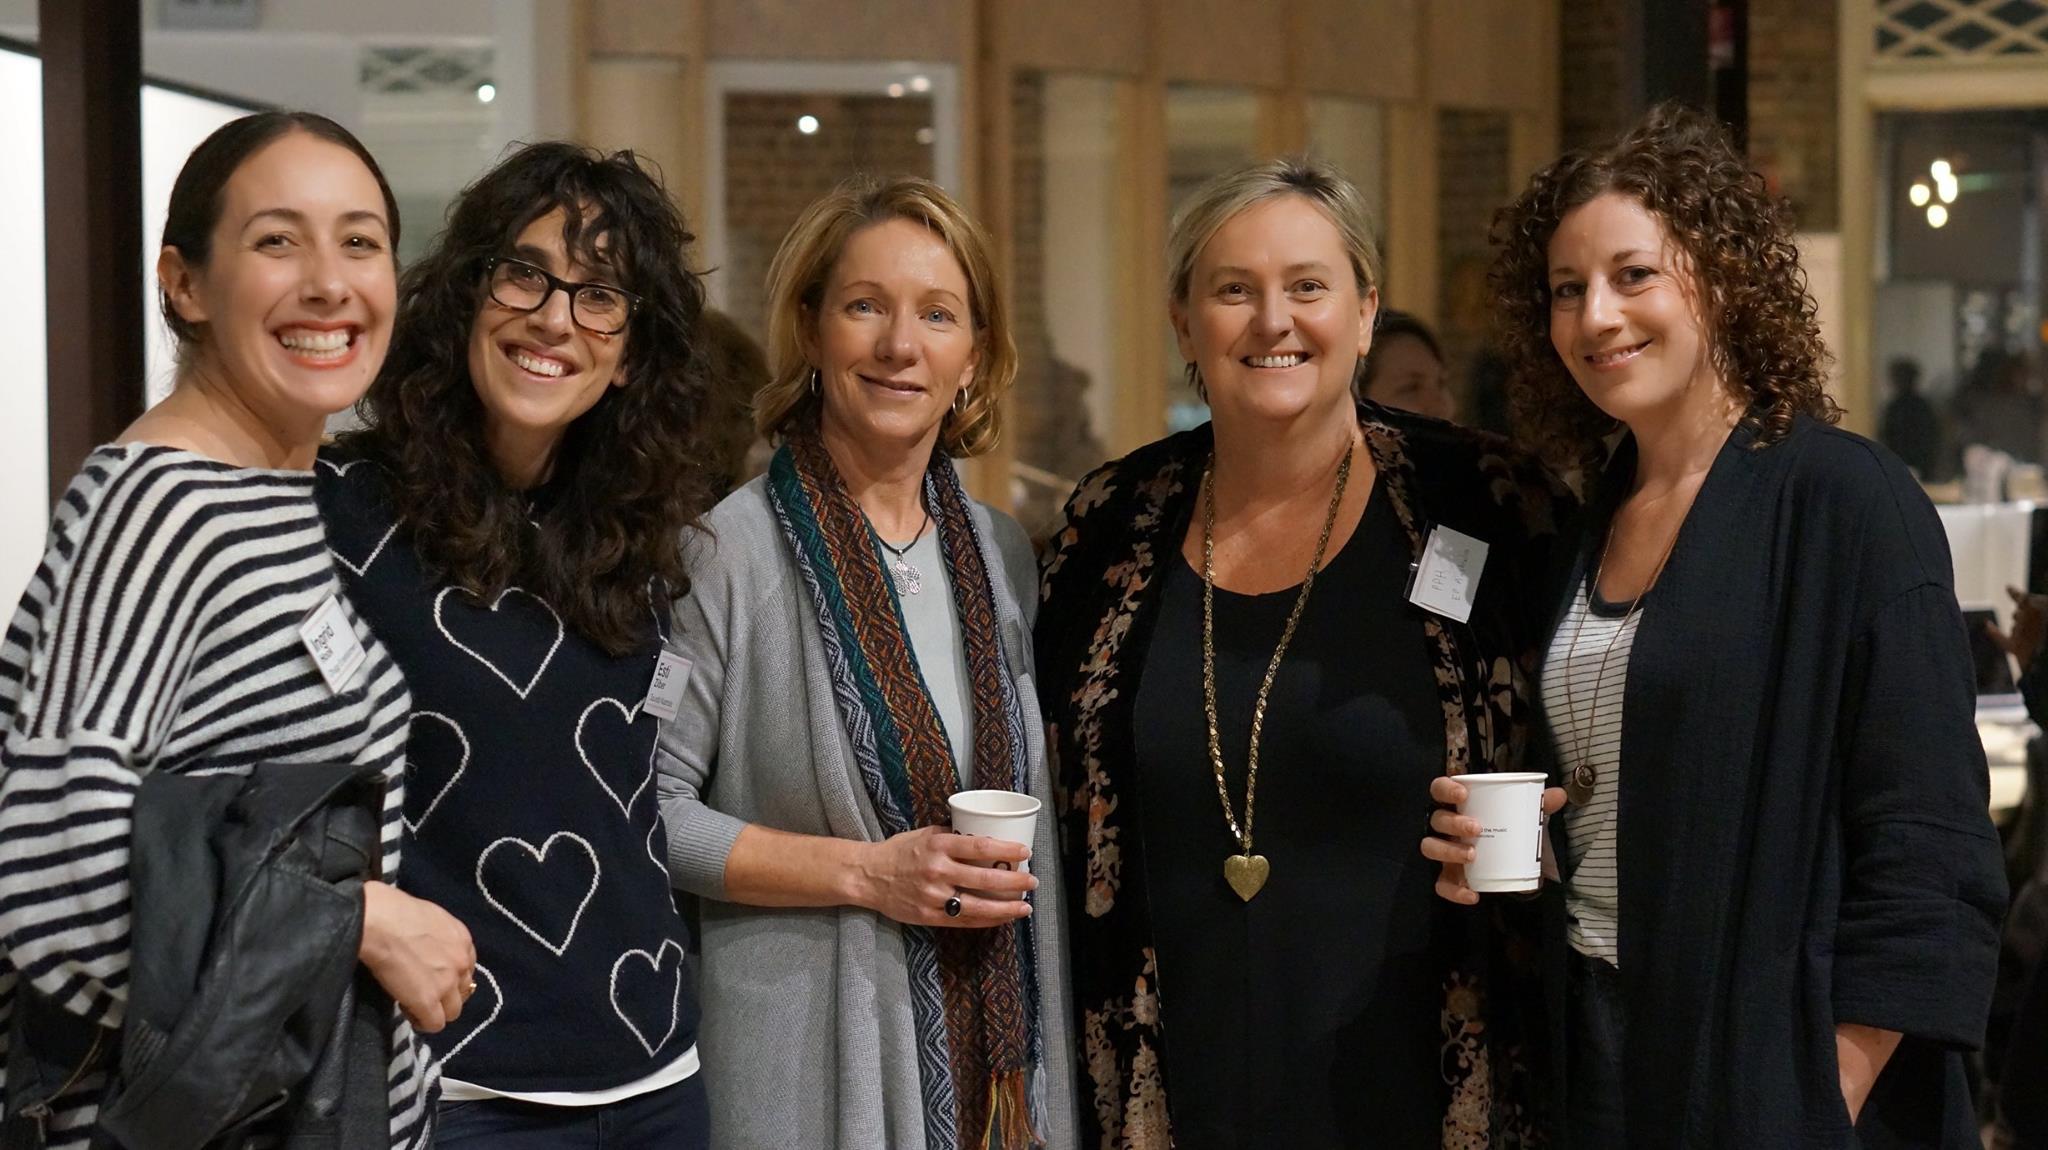 Susan Heymann with other women in music. Image via Facebook/WIMSydney